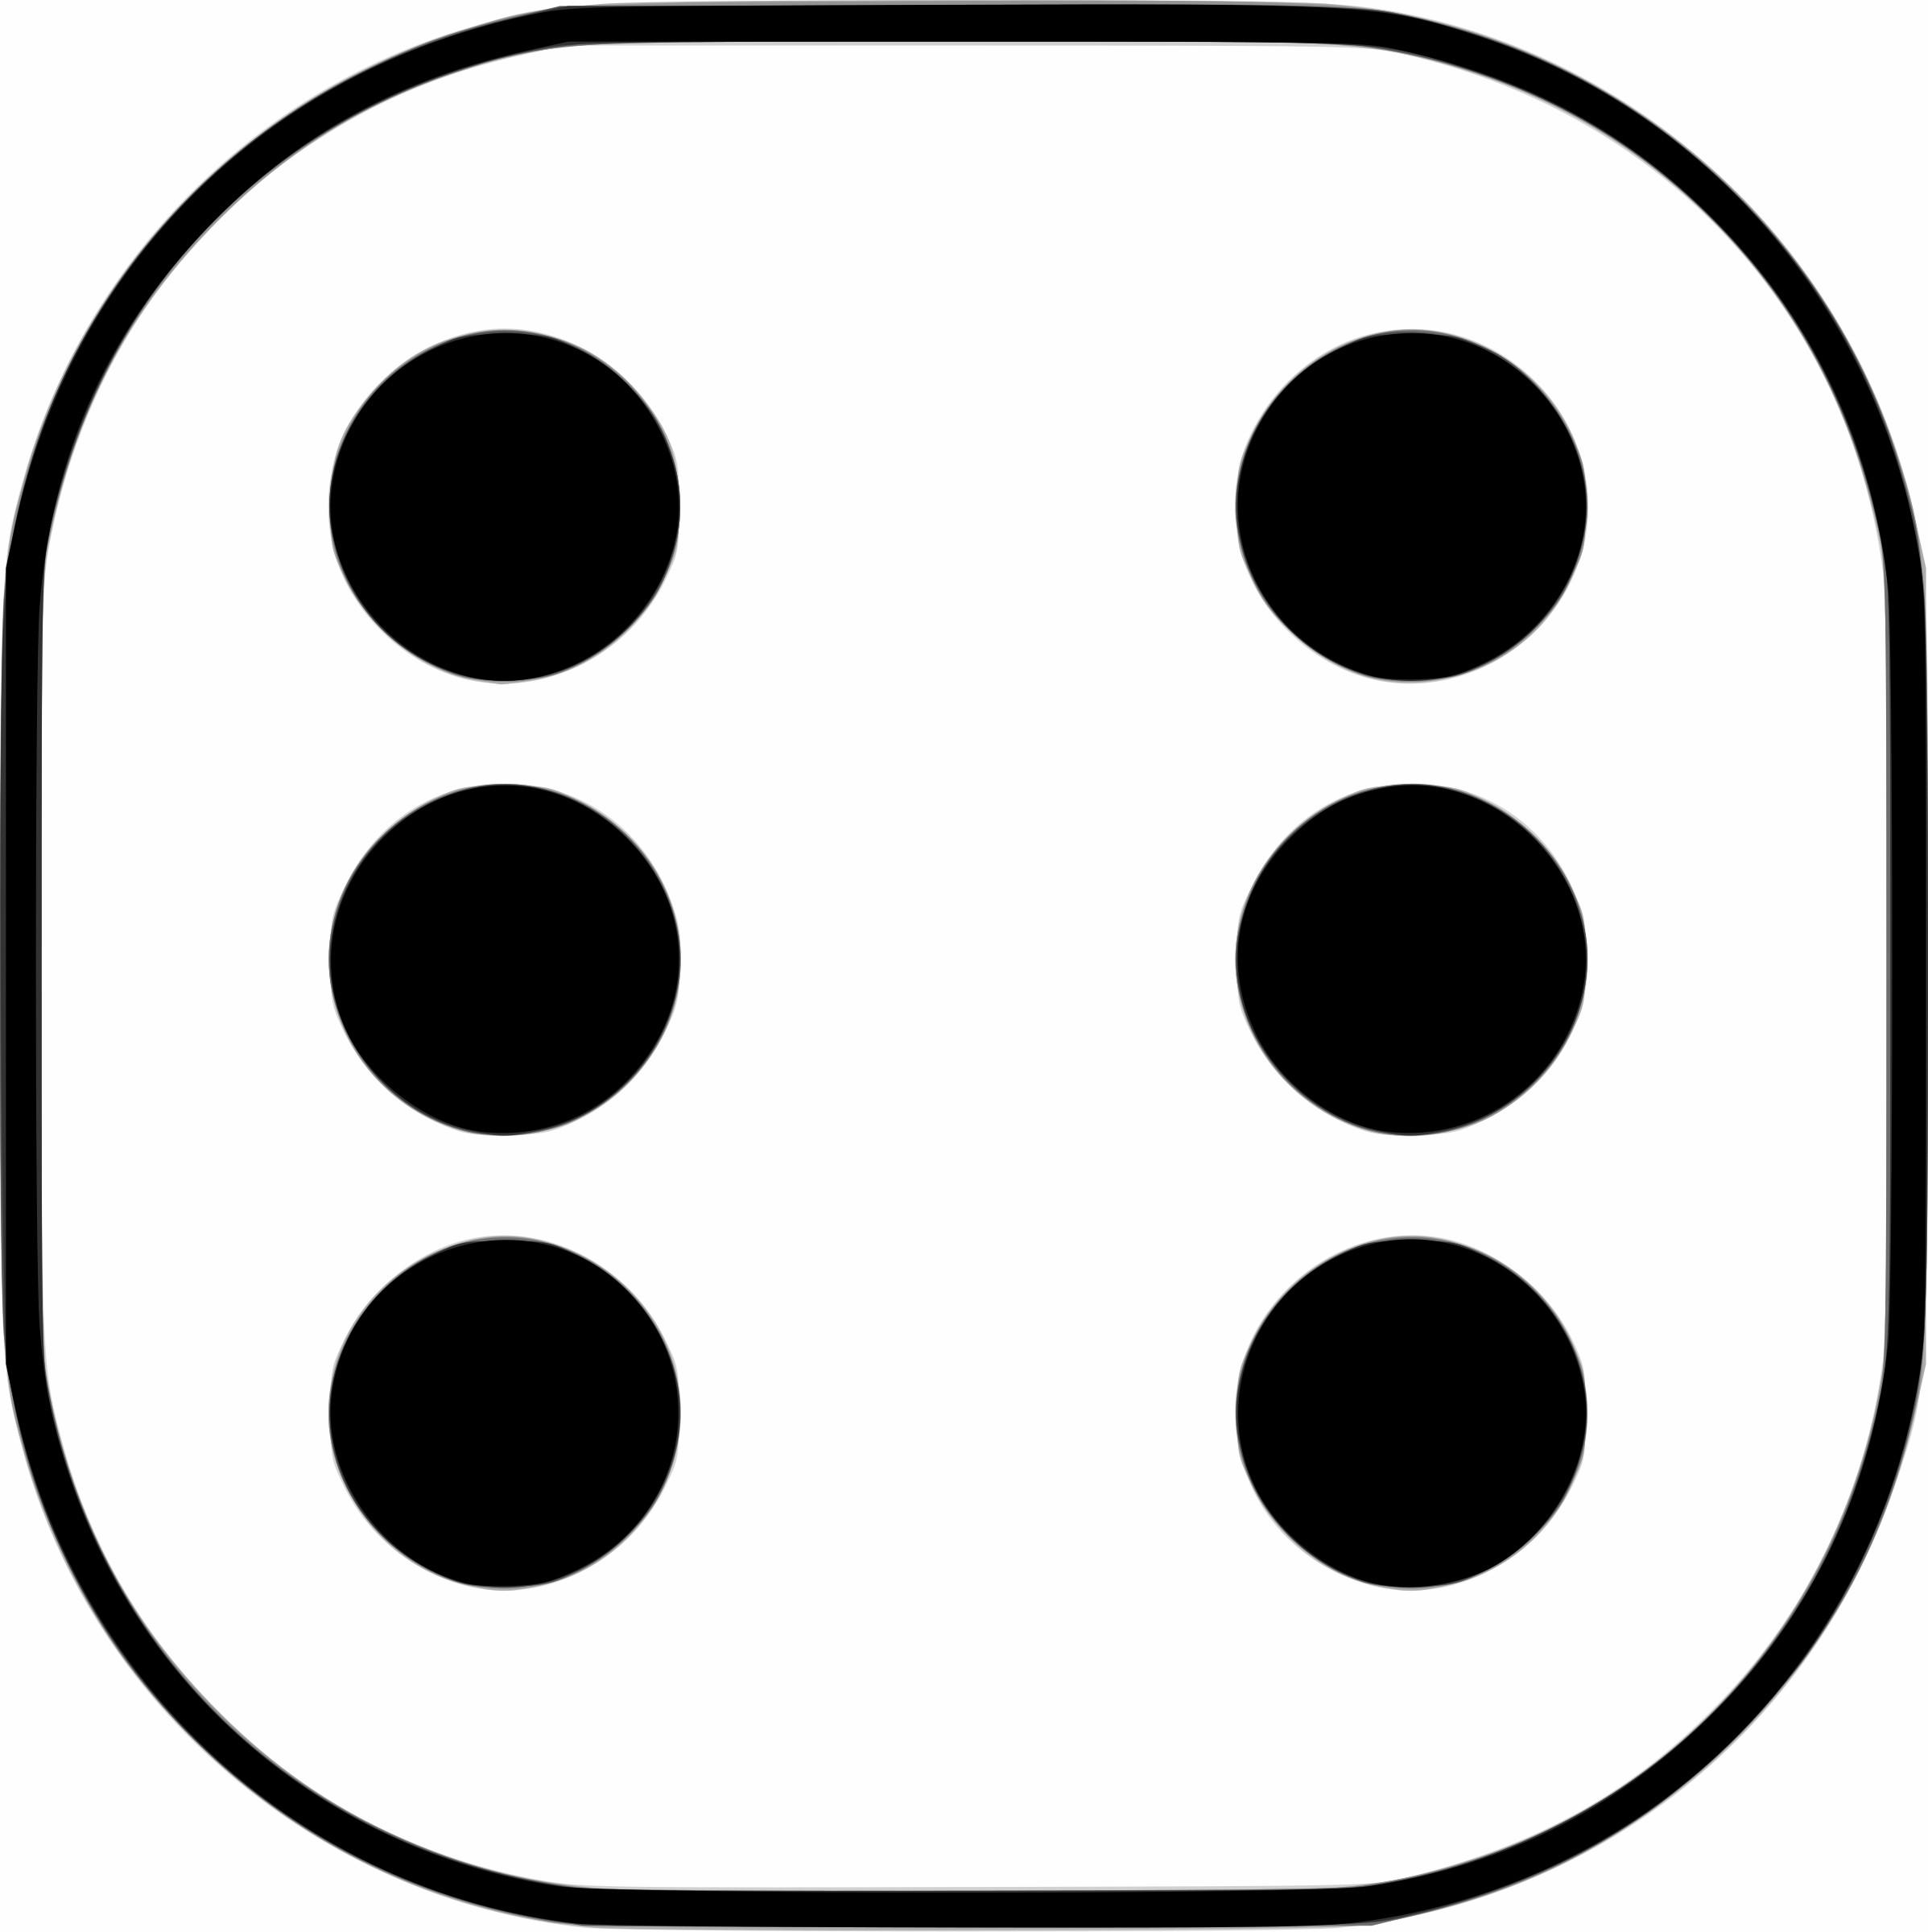 Elegant dice pattern diyar. Number 1 clipart 2clipart